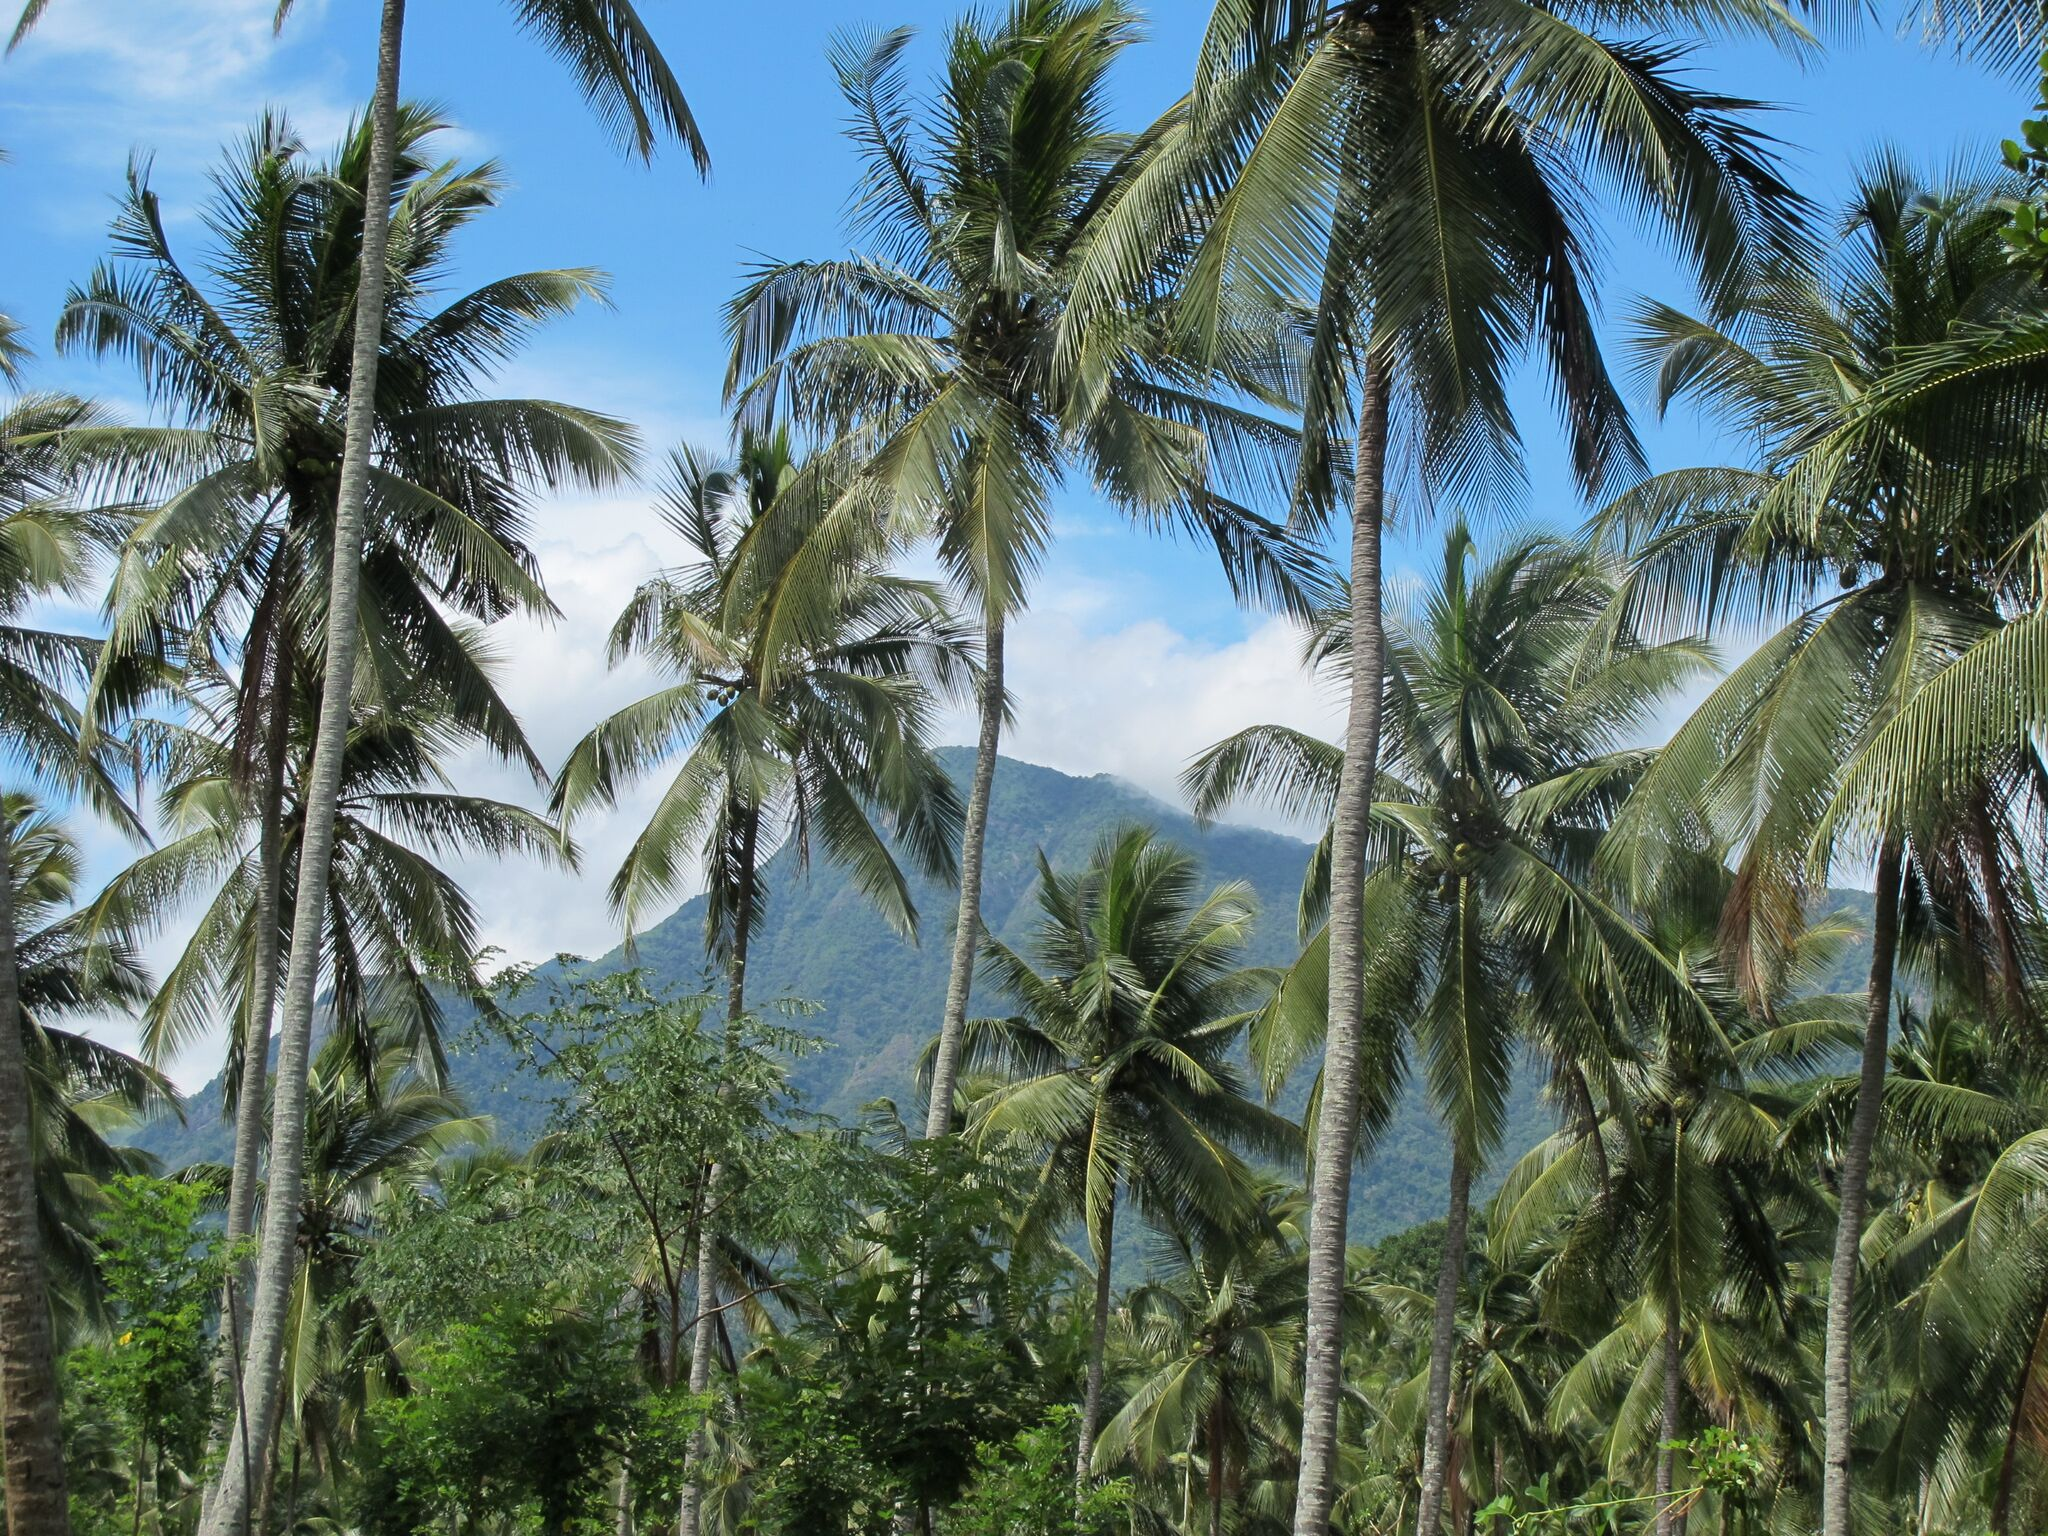 rejuvenate in Tropical greenery - InSpiral Escapes to Sri Lanka 5th-15th November 2018